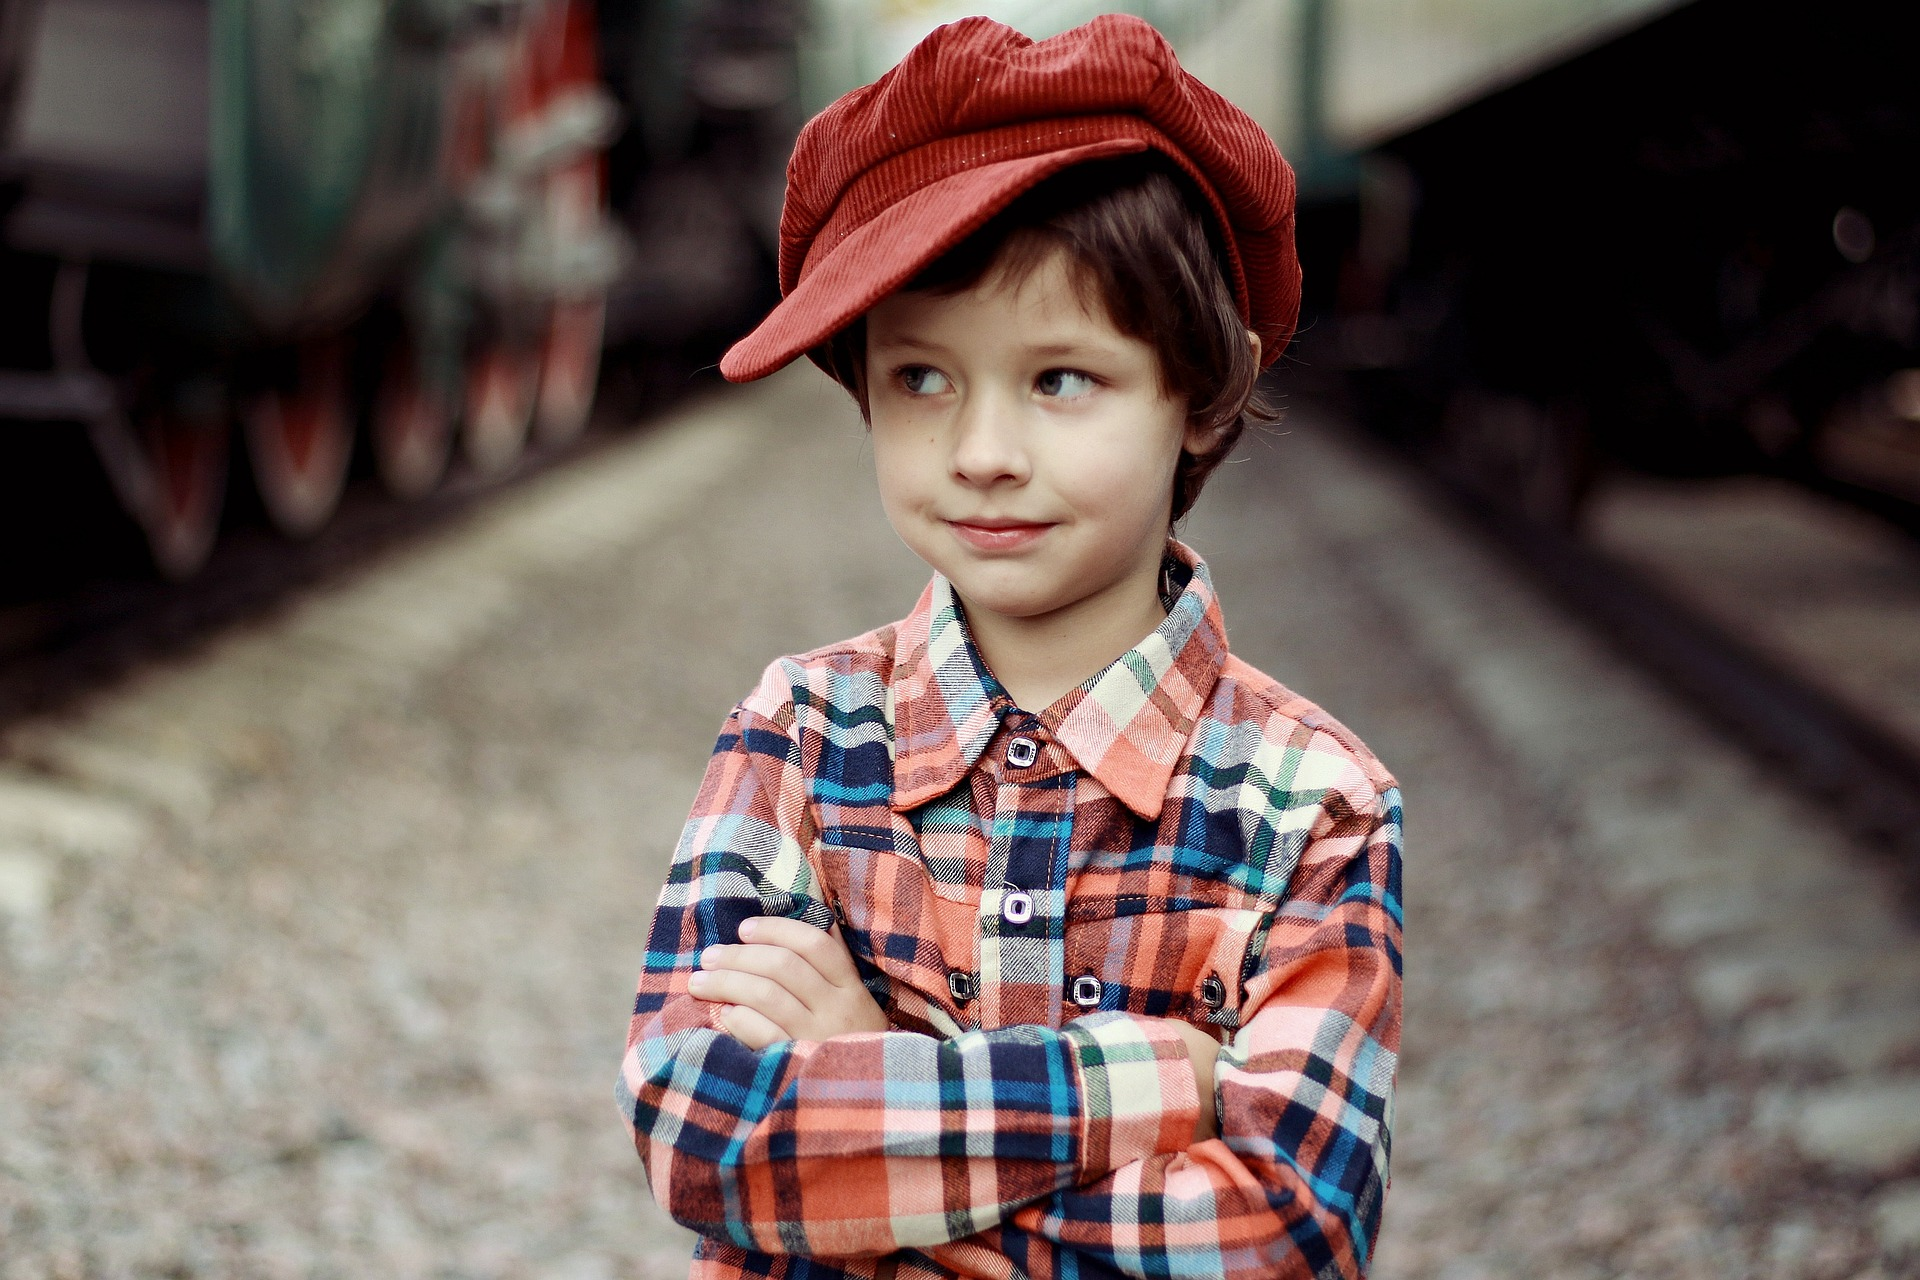 Psicología infantil para entender la musicoterapia